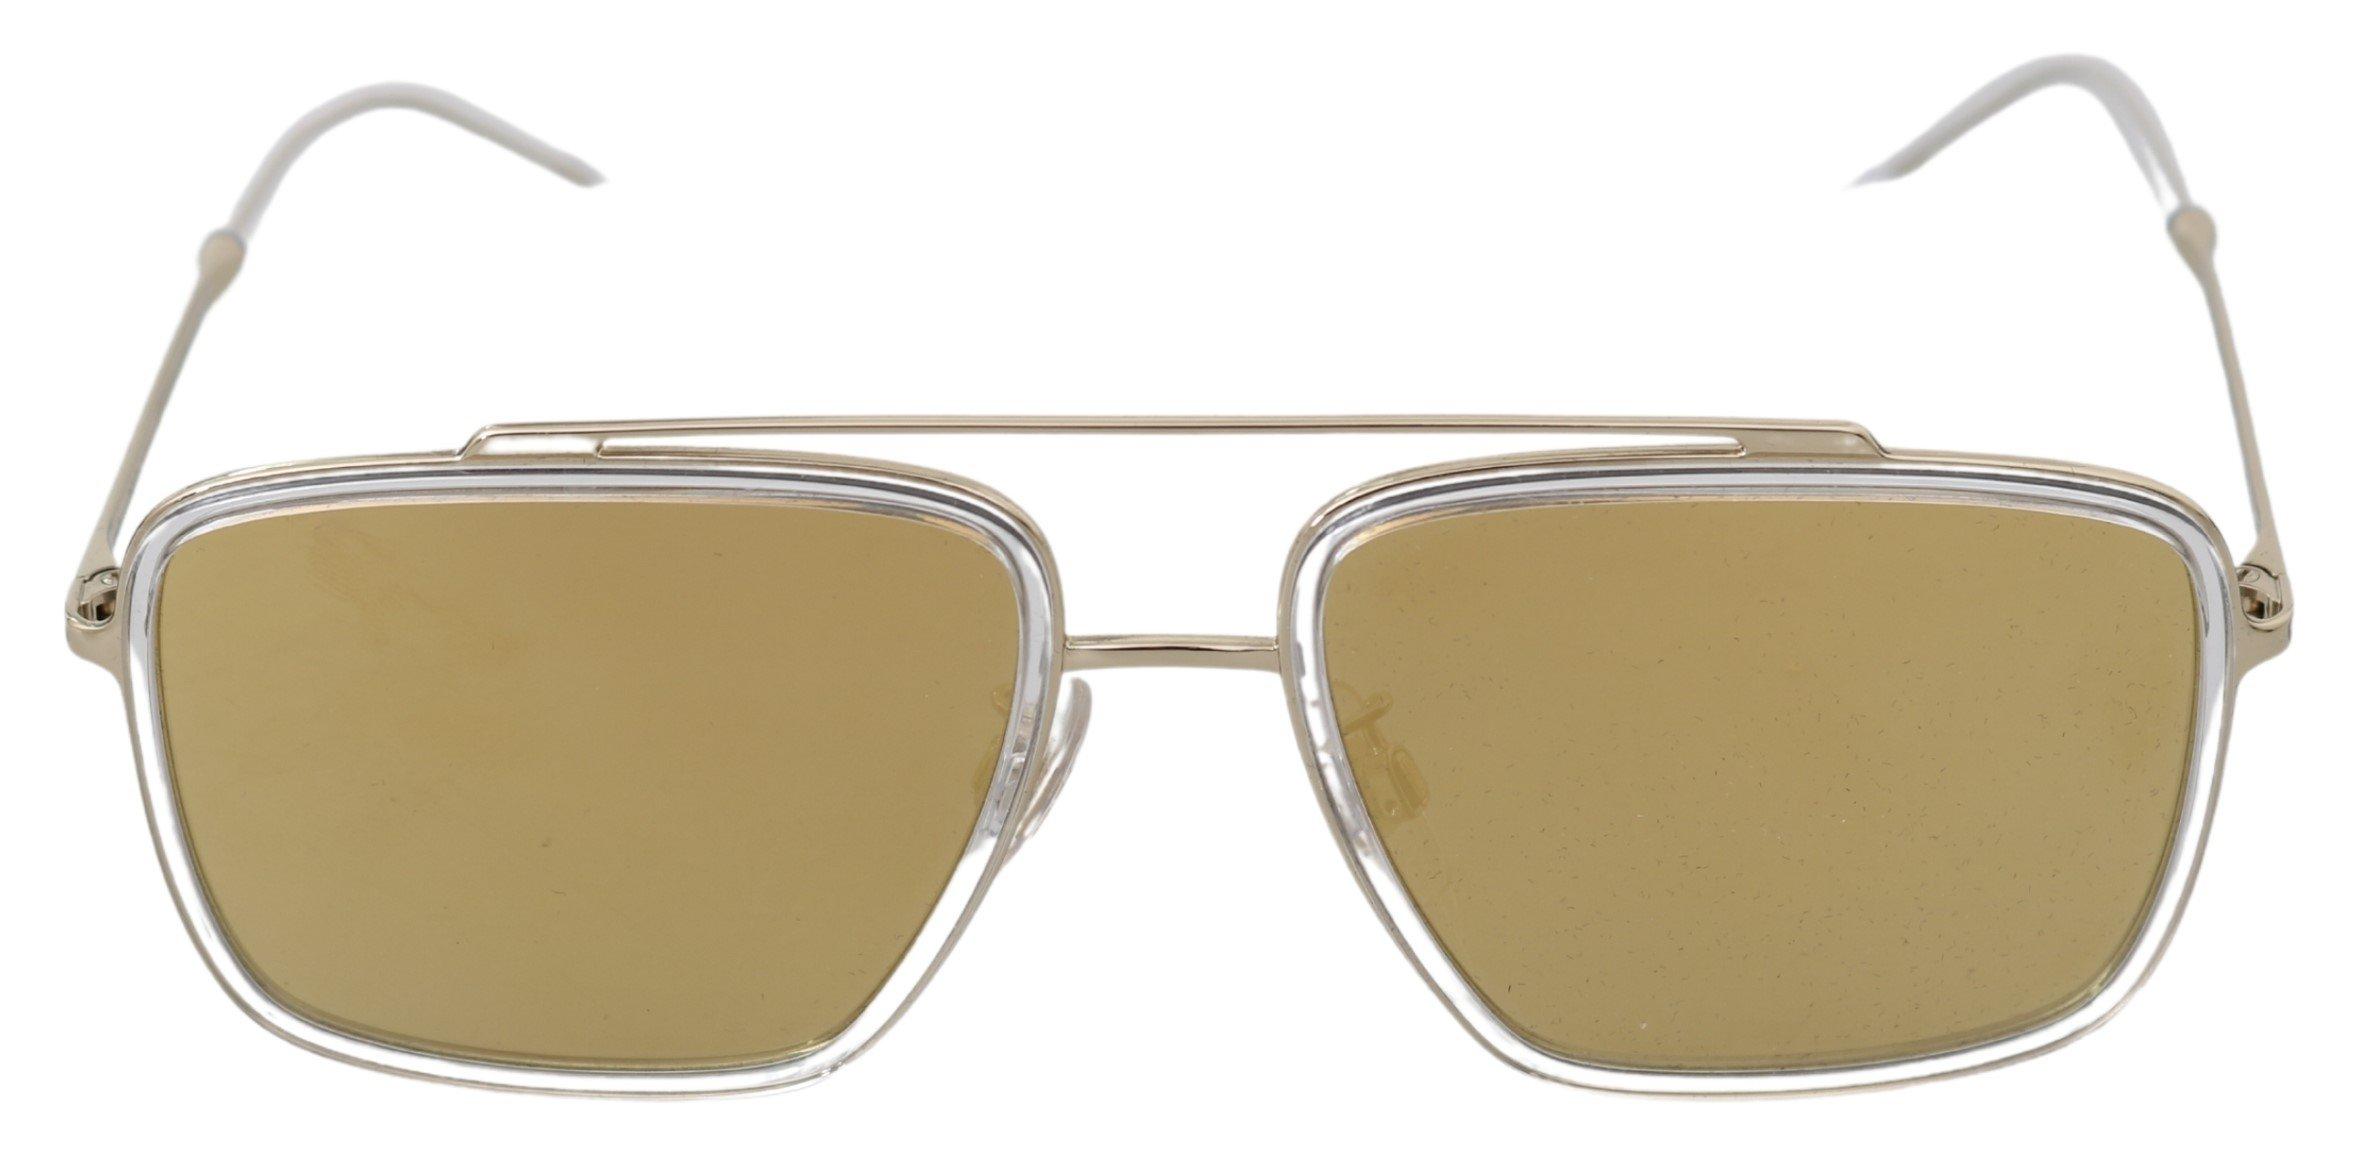 Dolce & Gabbana Women's MIirored Pilot Aviator Sunglasses Gold GLA768